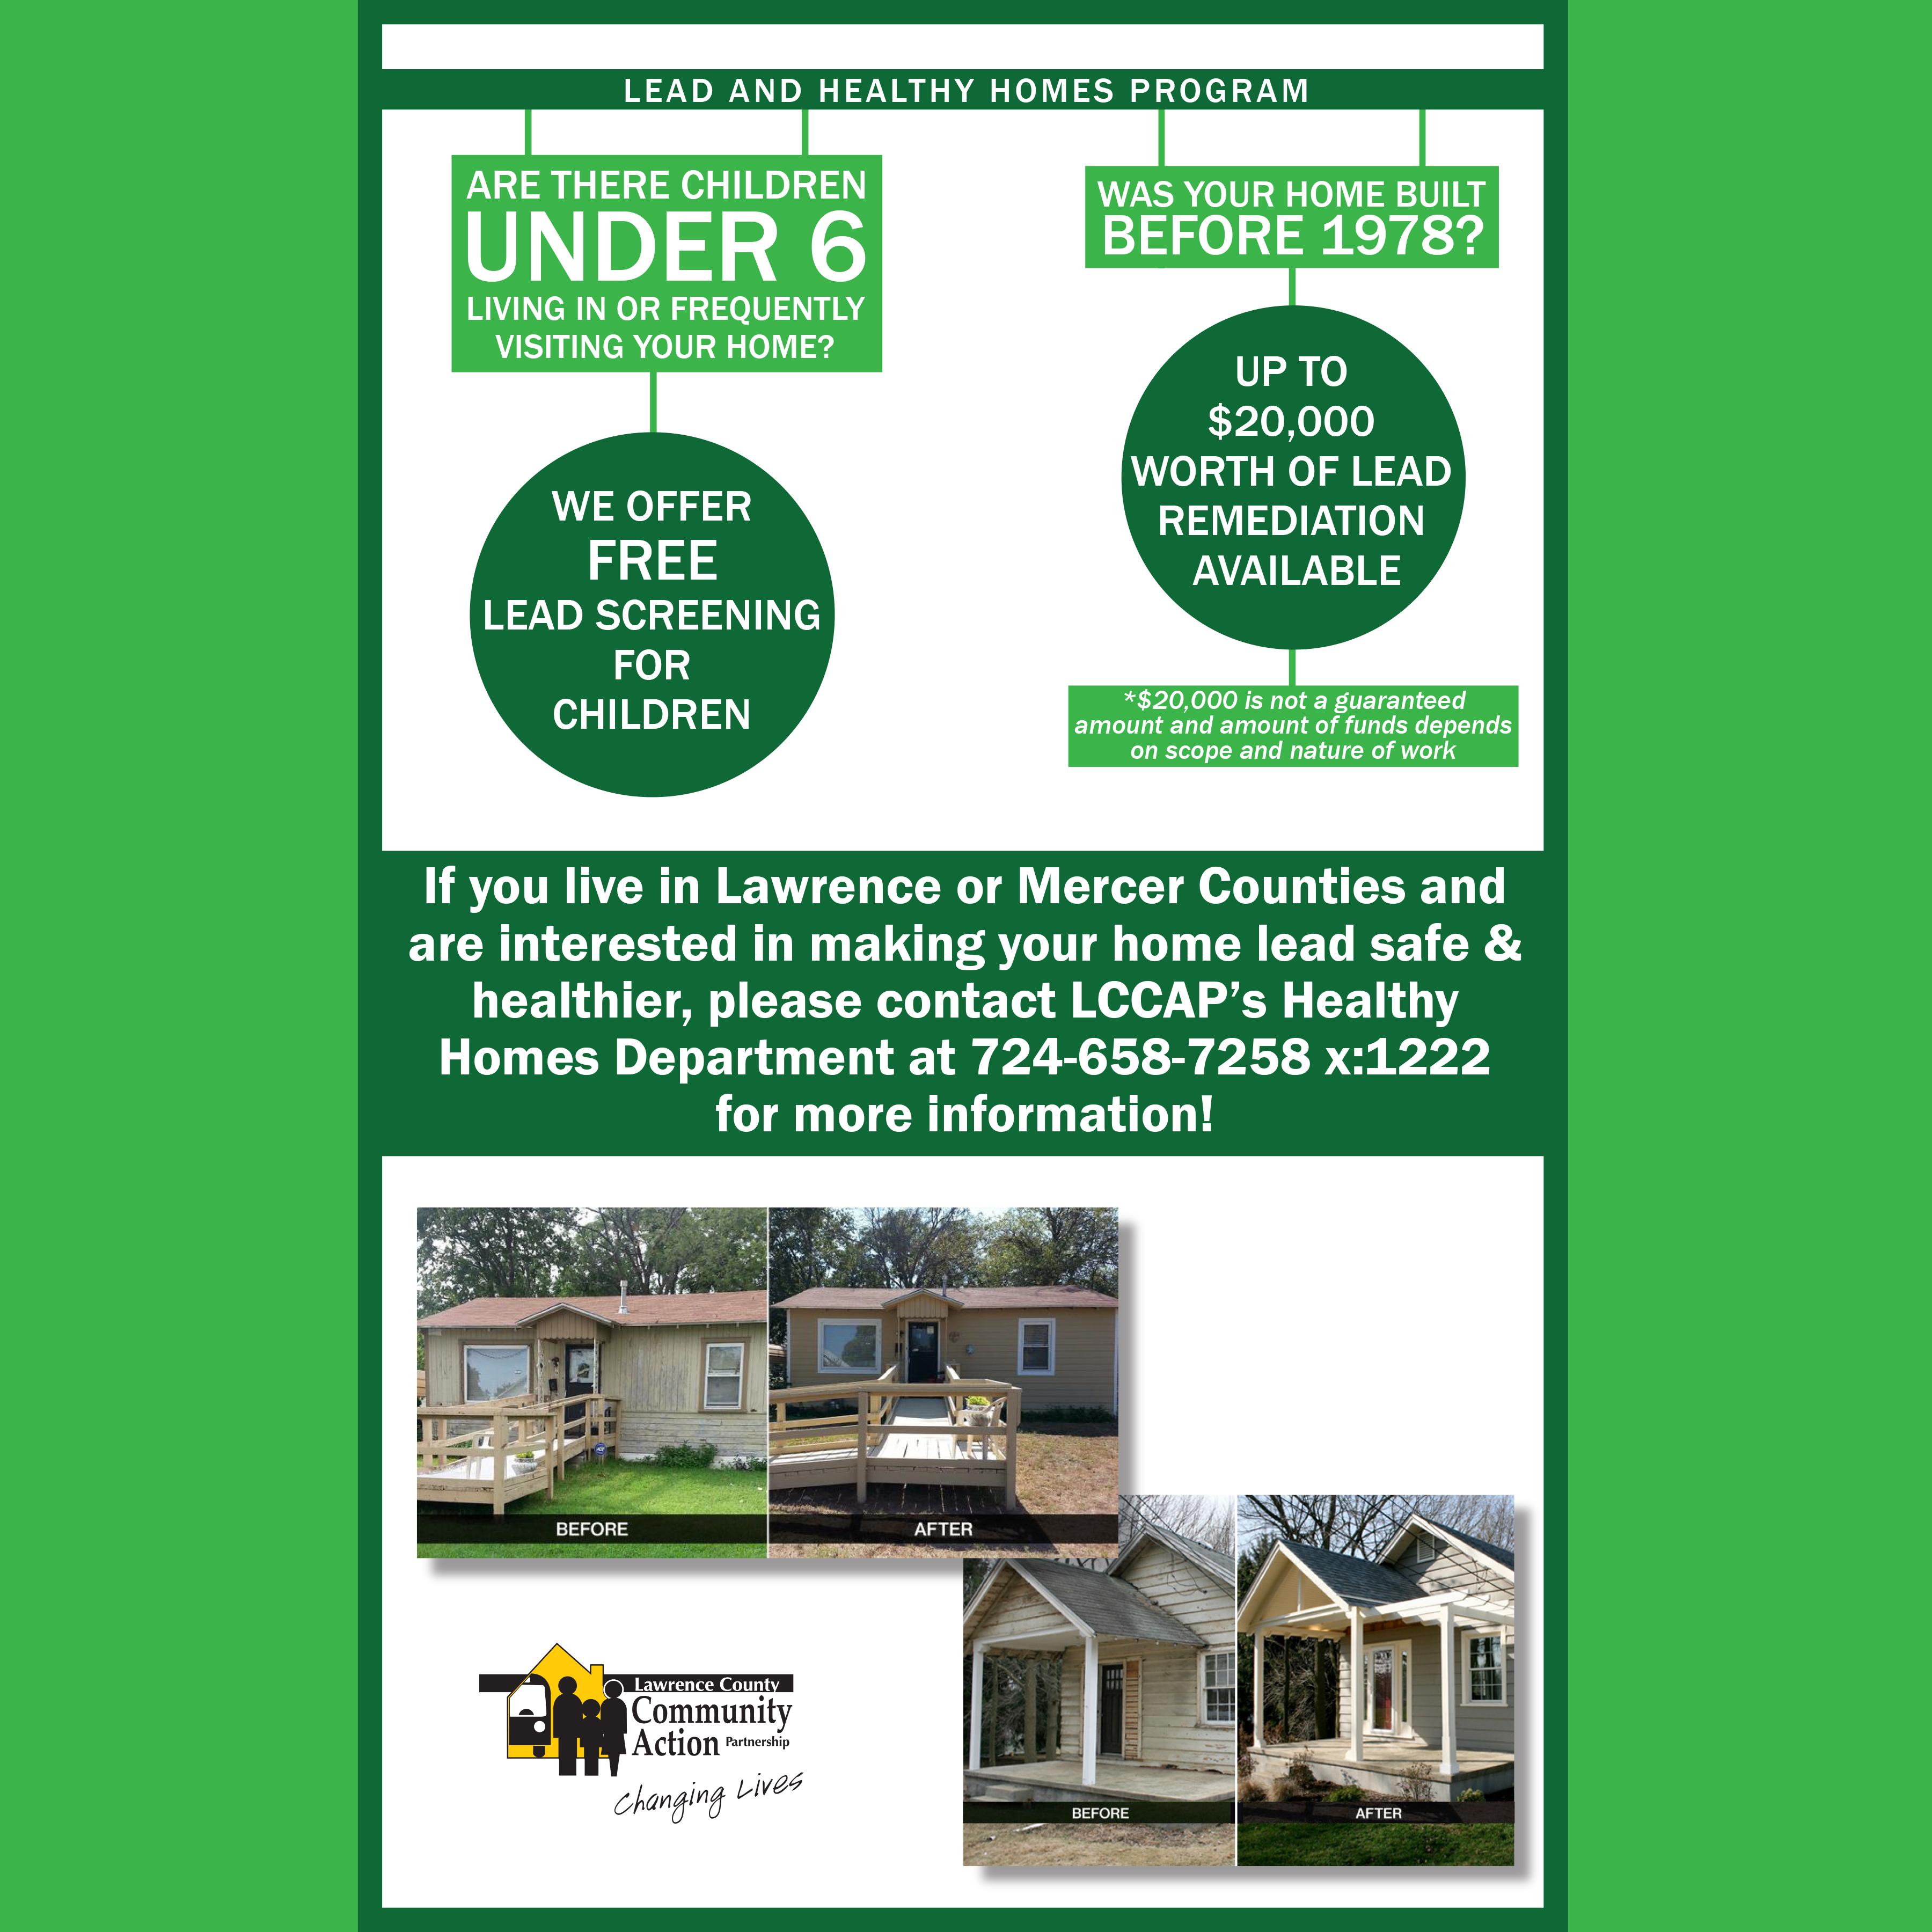 Pa Lead Healthy Homes Program